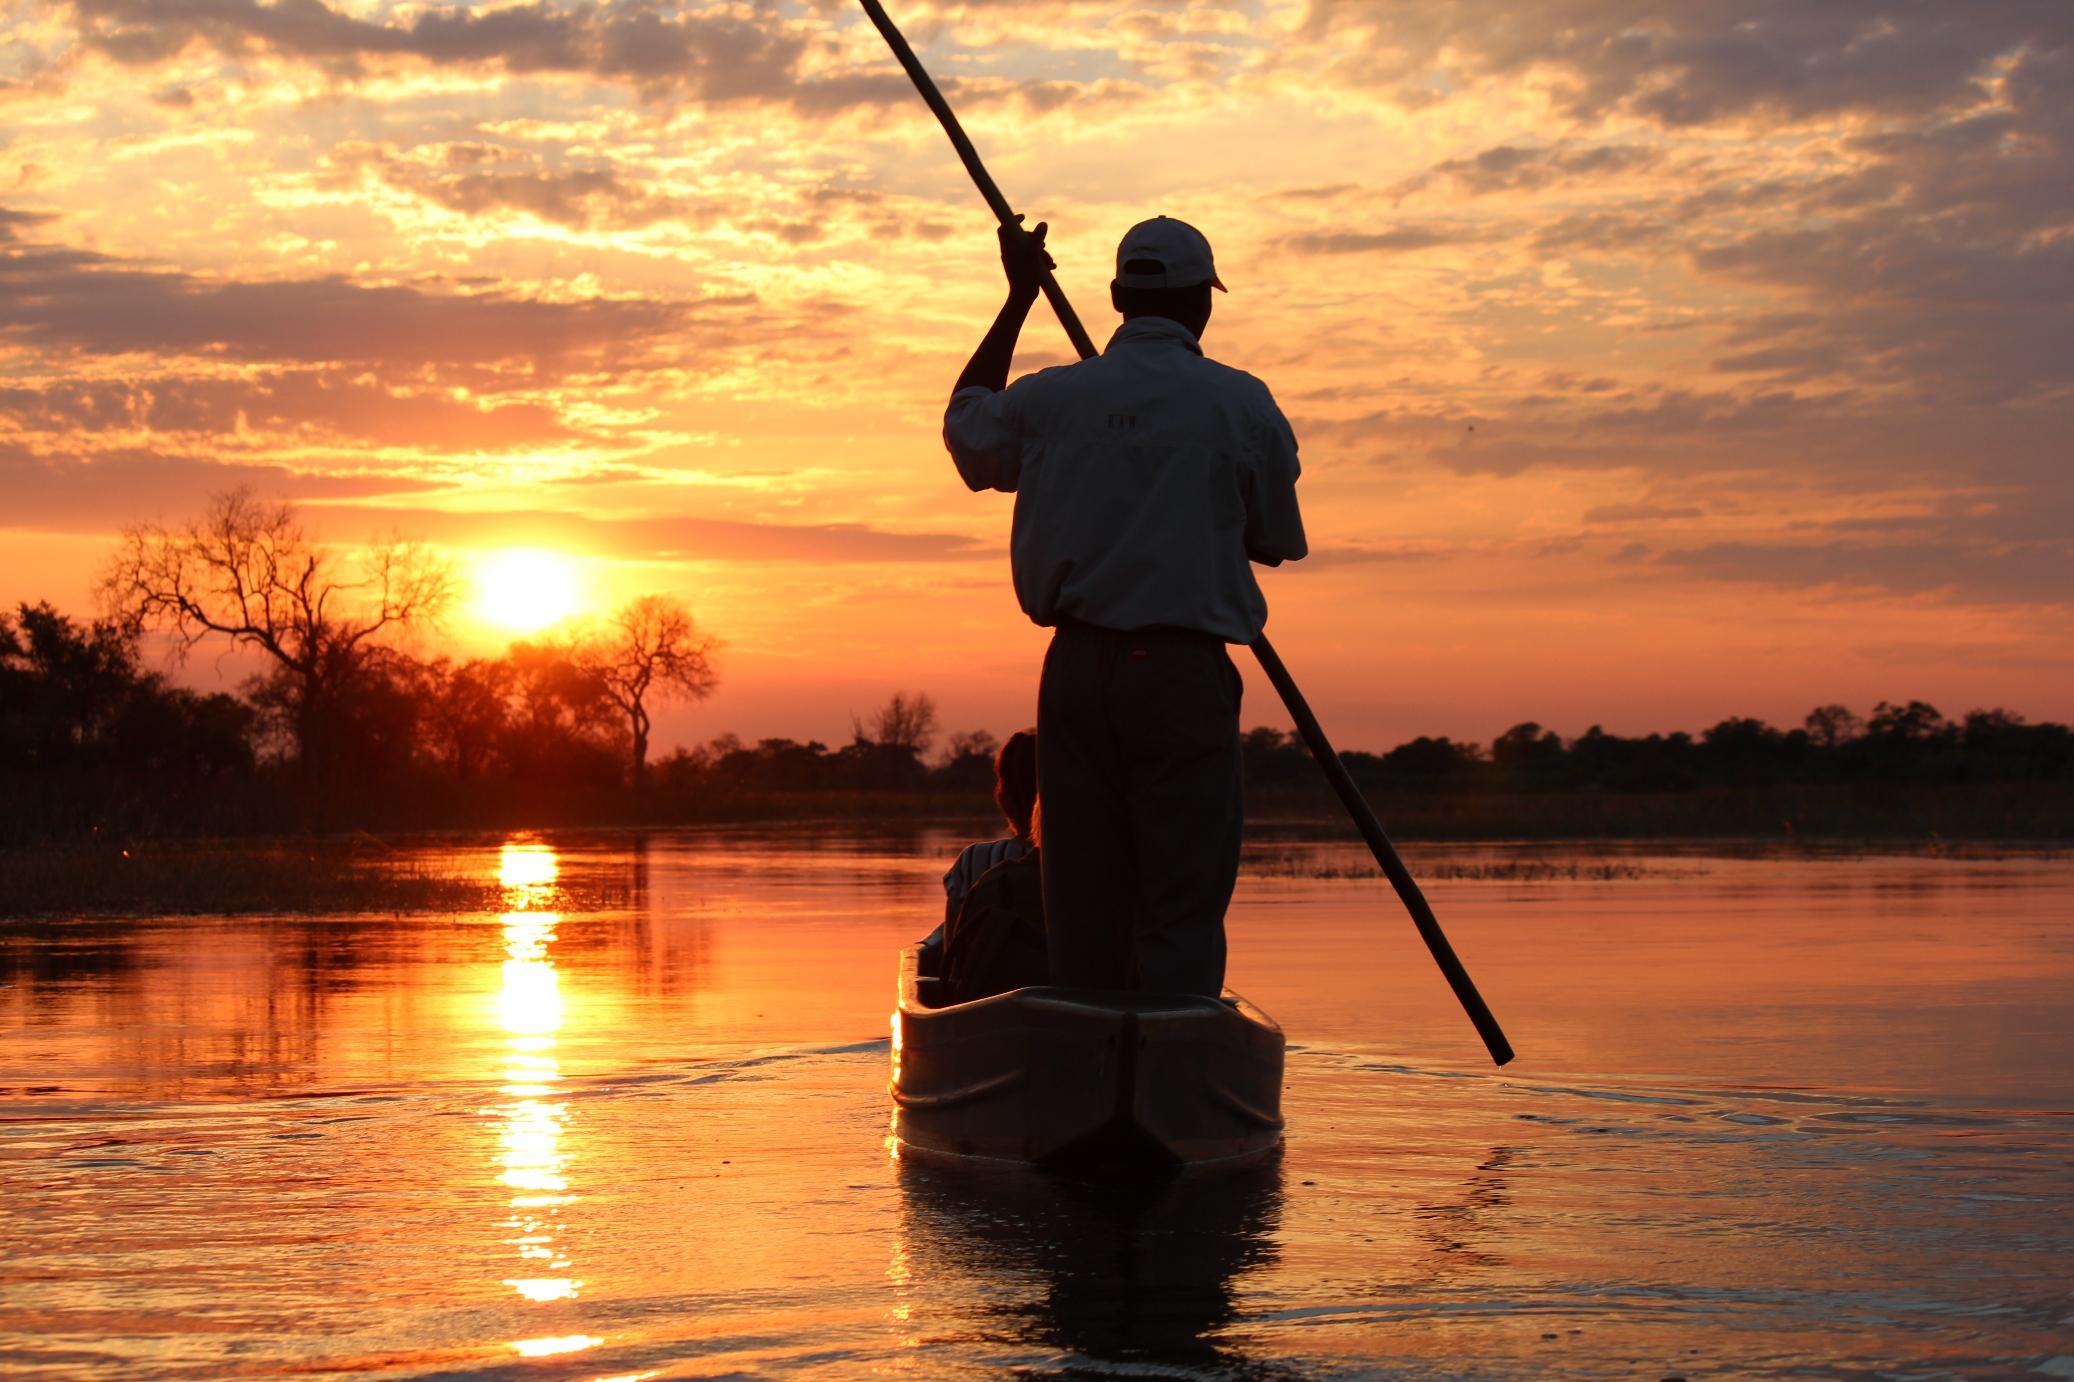 RAW Motswiri Botswana boating sunset